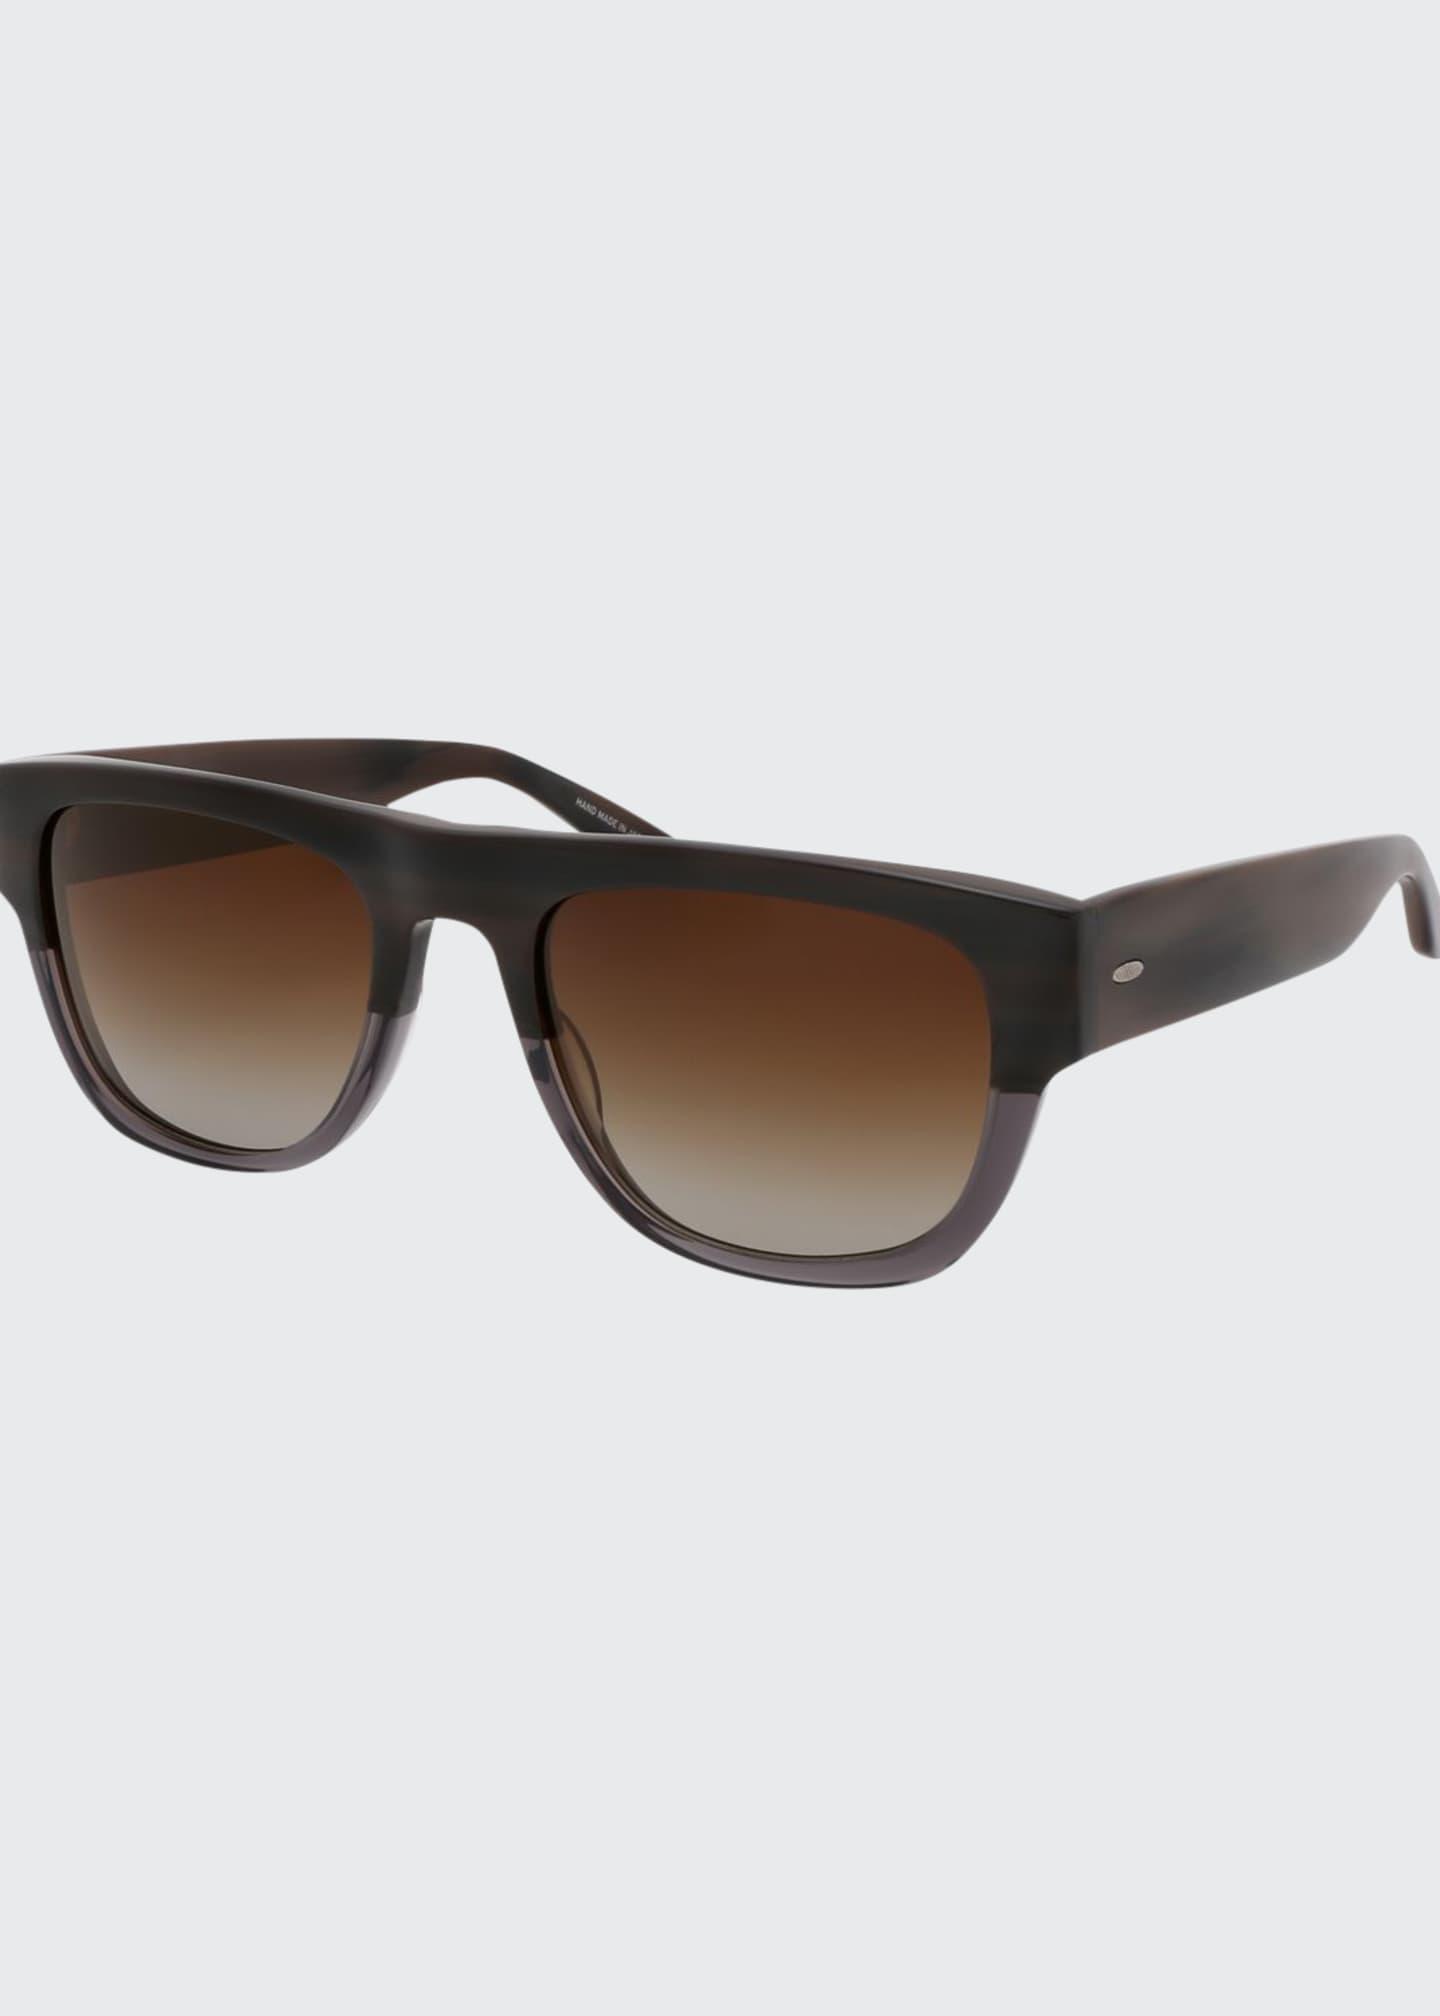 Barton Perreira Men's Kahuna Square Acetate Sunglasses